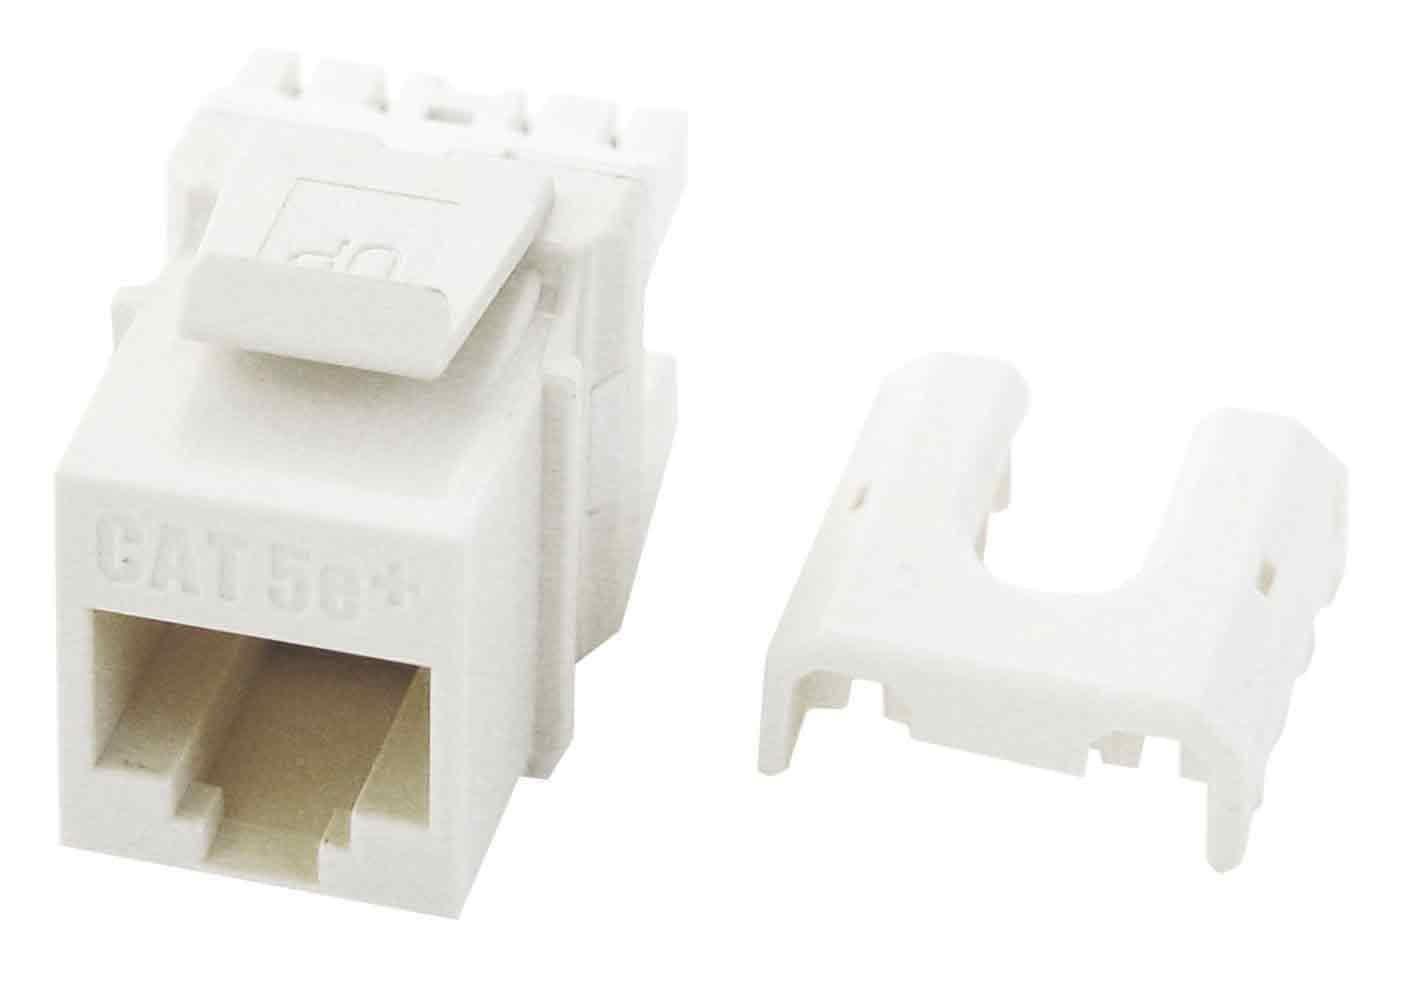 Legrand - On-Q WP3475WH50 RJ45 Cat5e QC Keystone Insert (50 pack), White